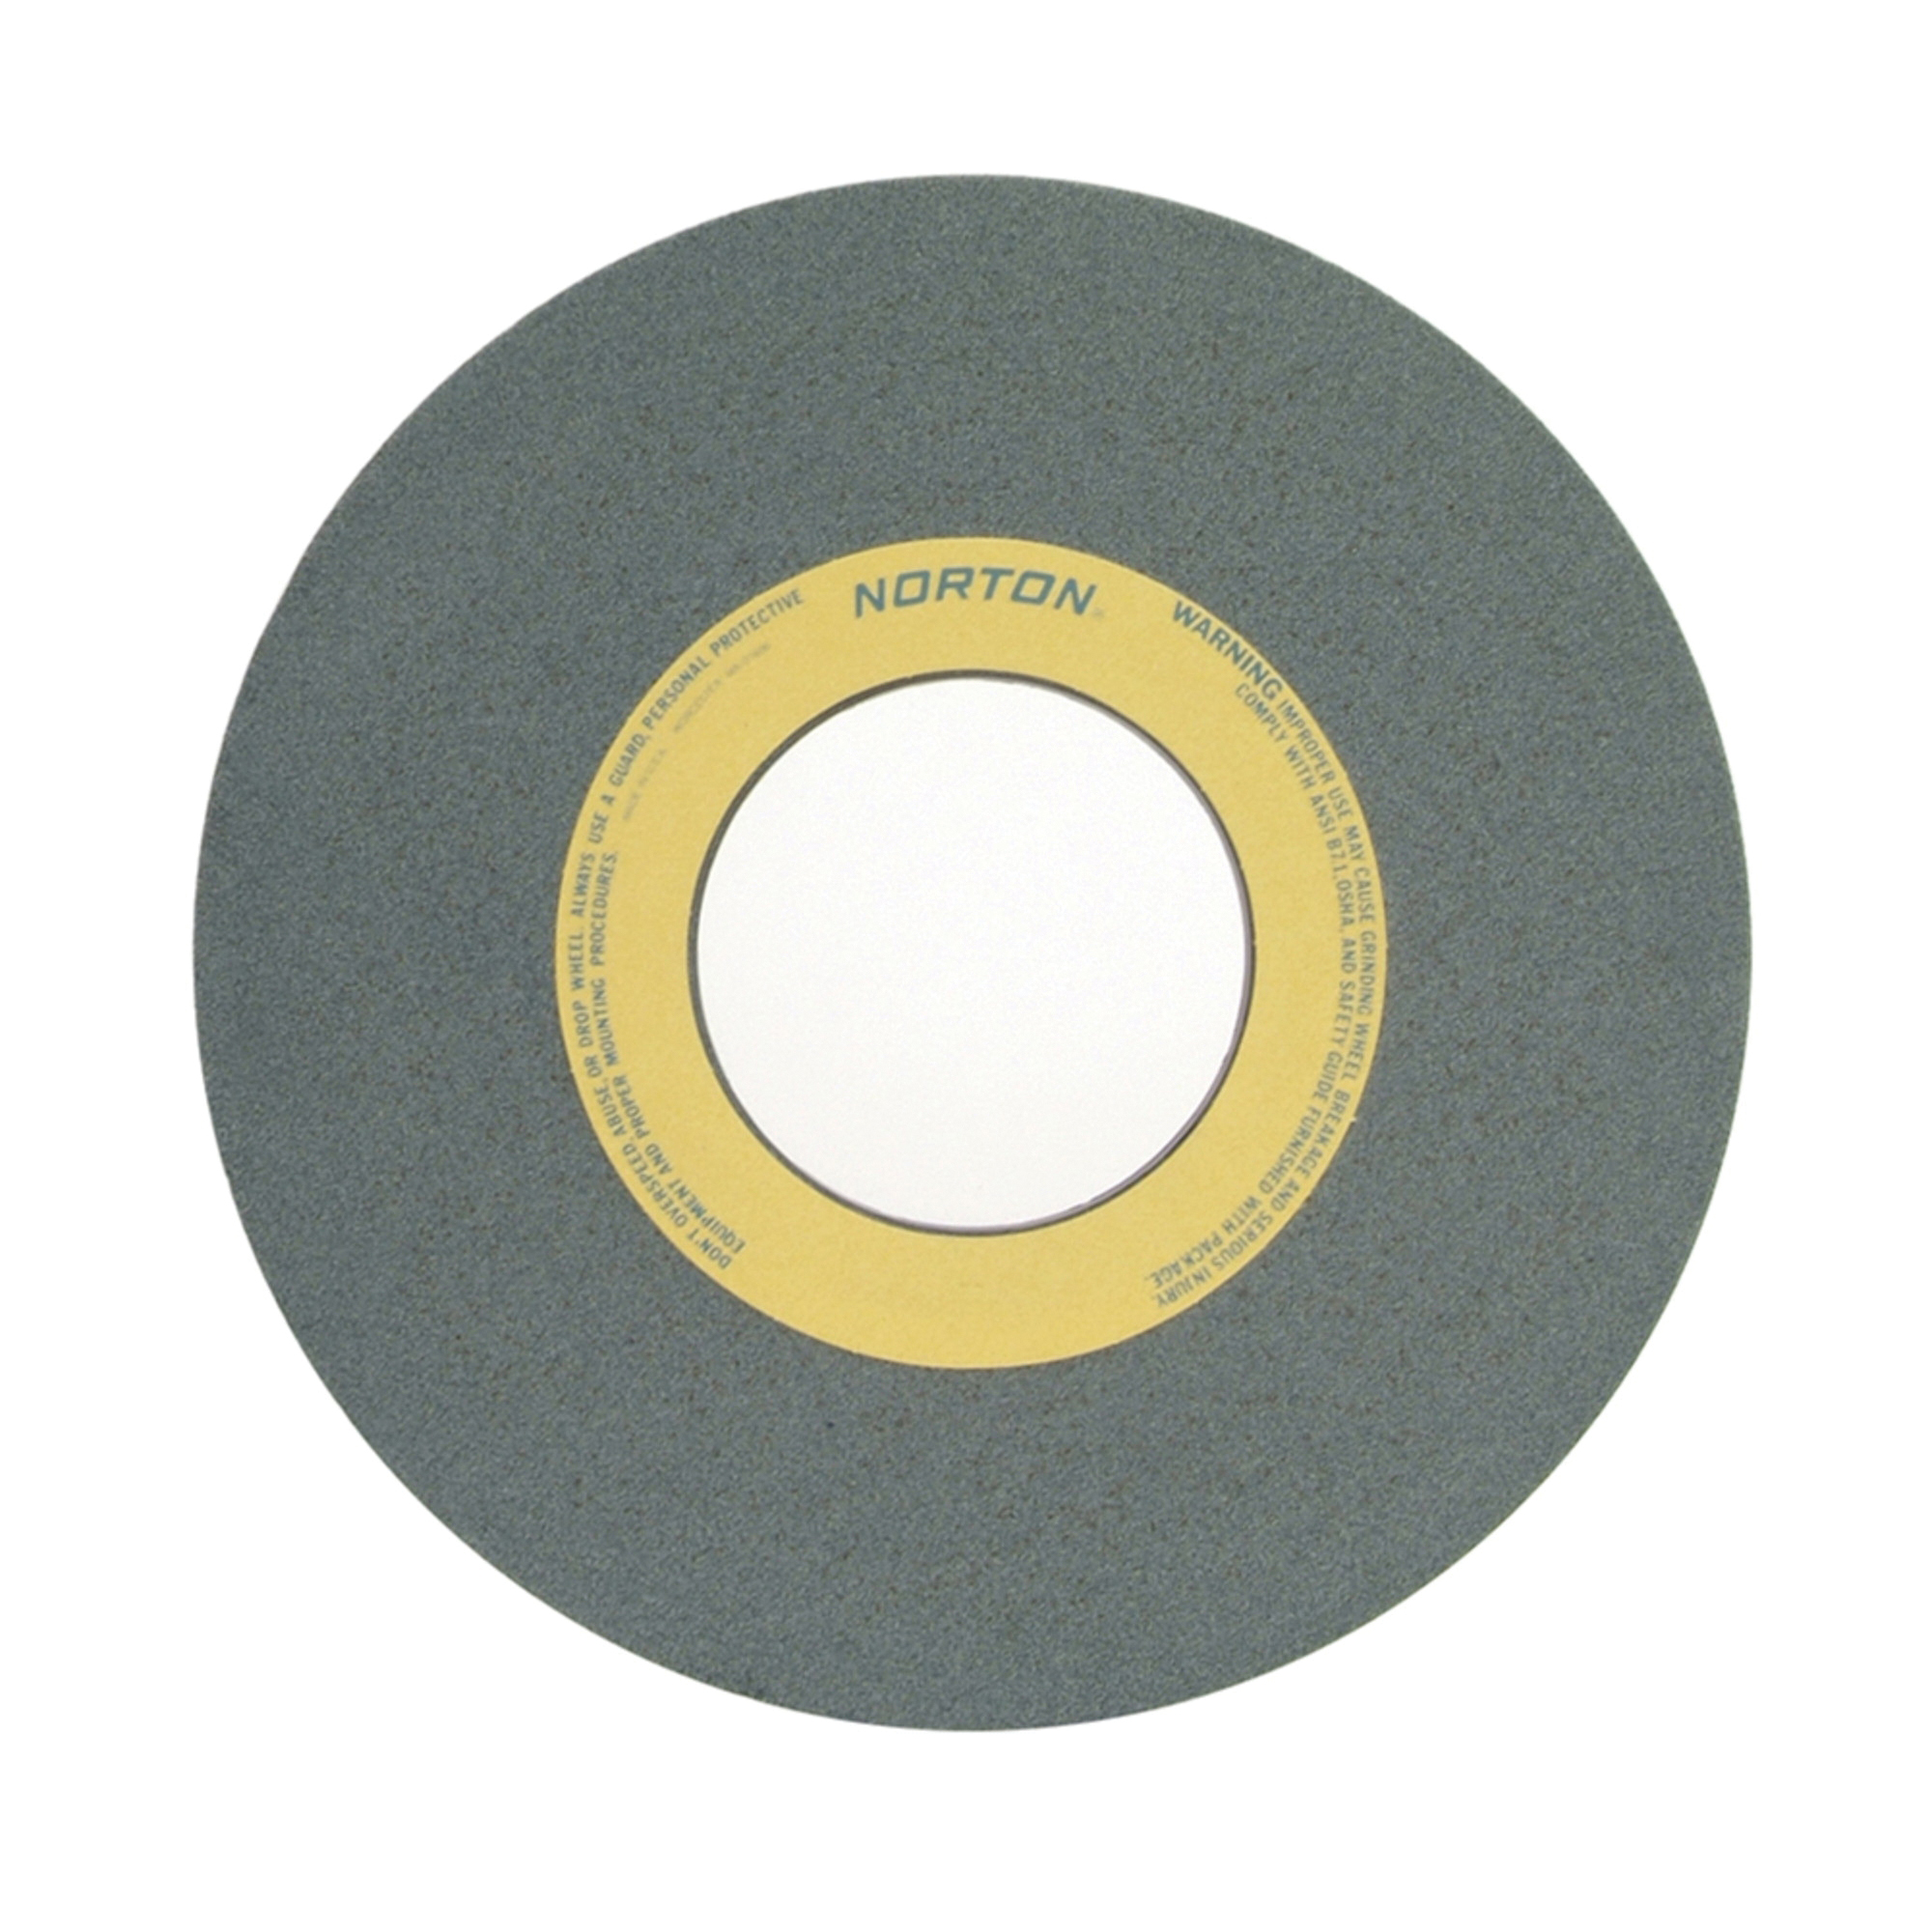 Norton® 66253364242 39C Straight Toolroom Wheel, 14 in Dia x 1-1/2 in THK, 5 in Center Hole, 60 Grit, Silicon Carbide Abrasive